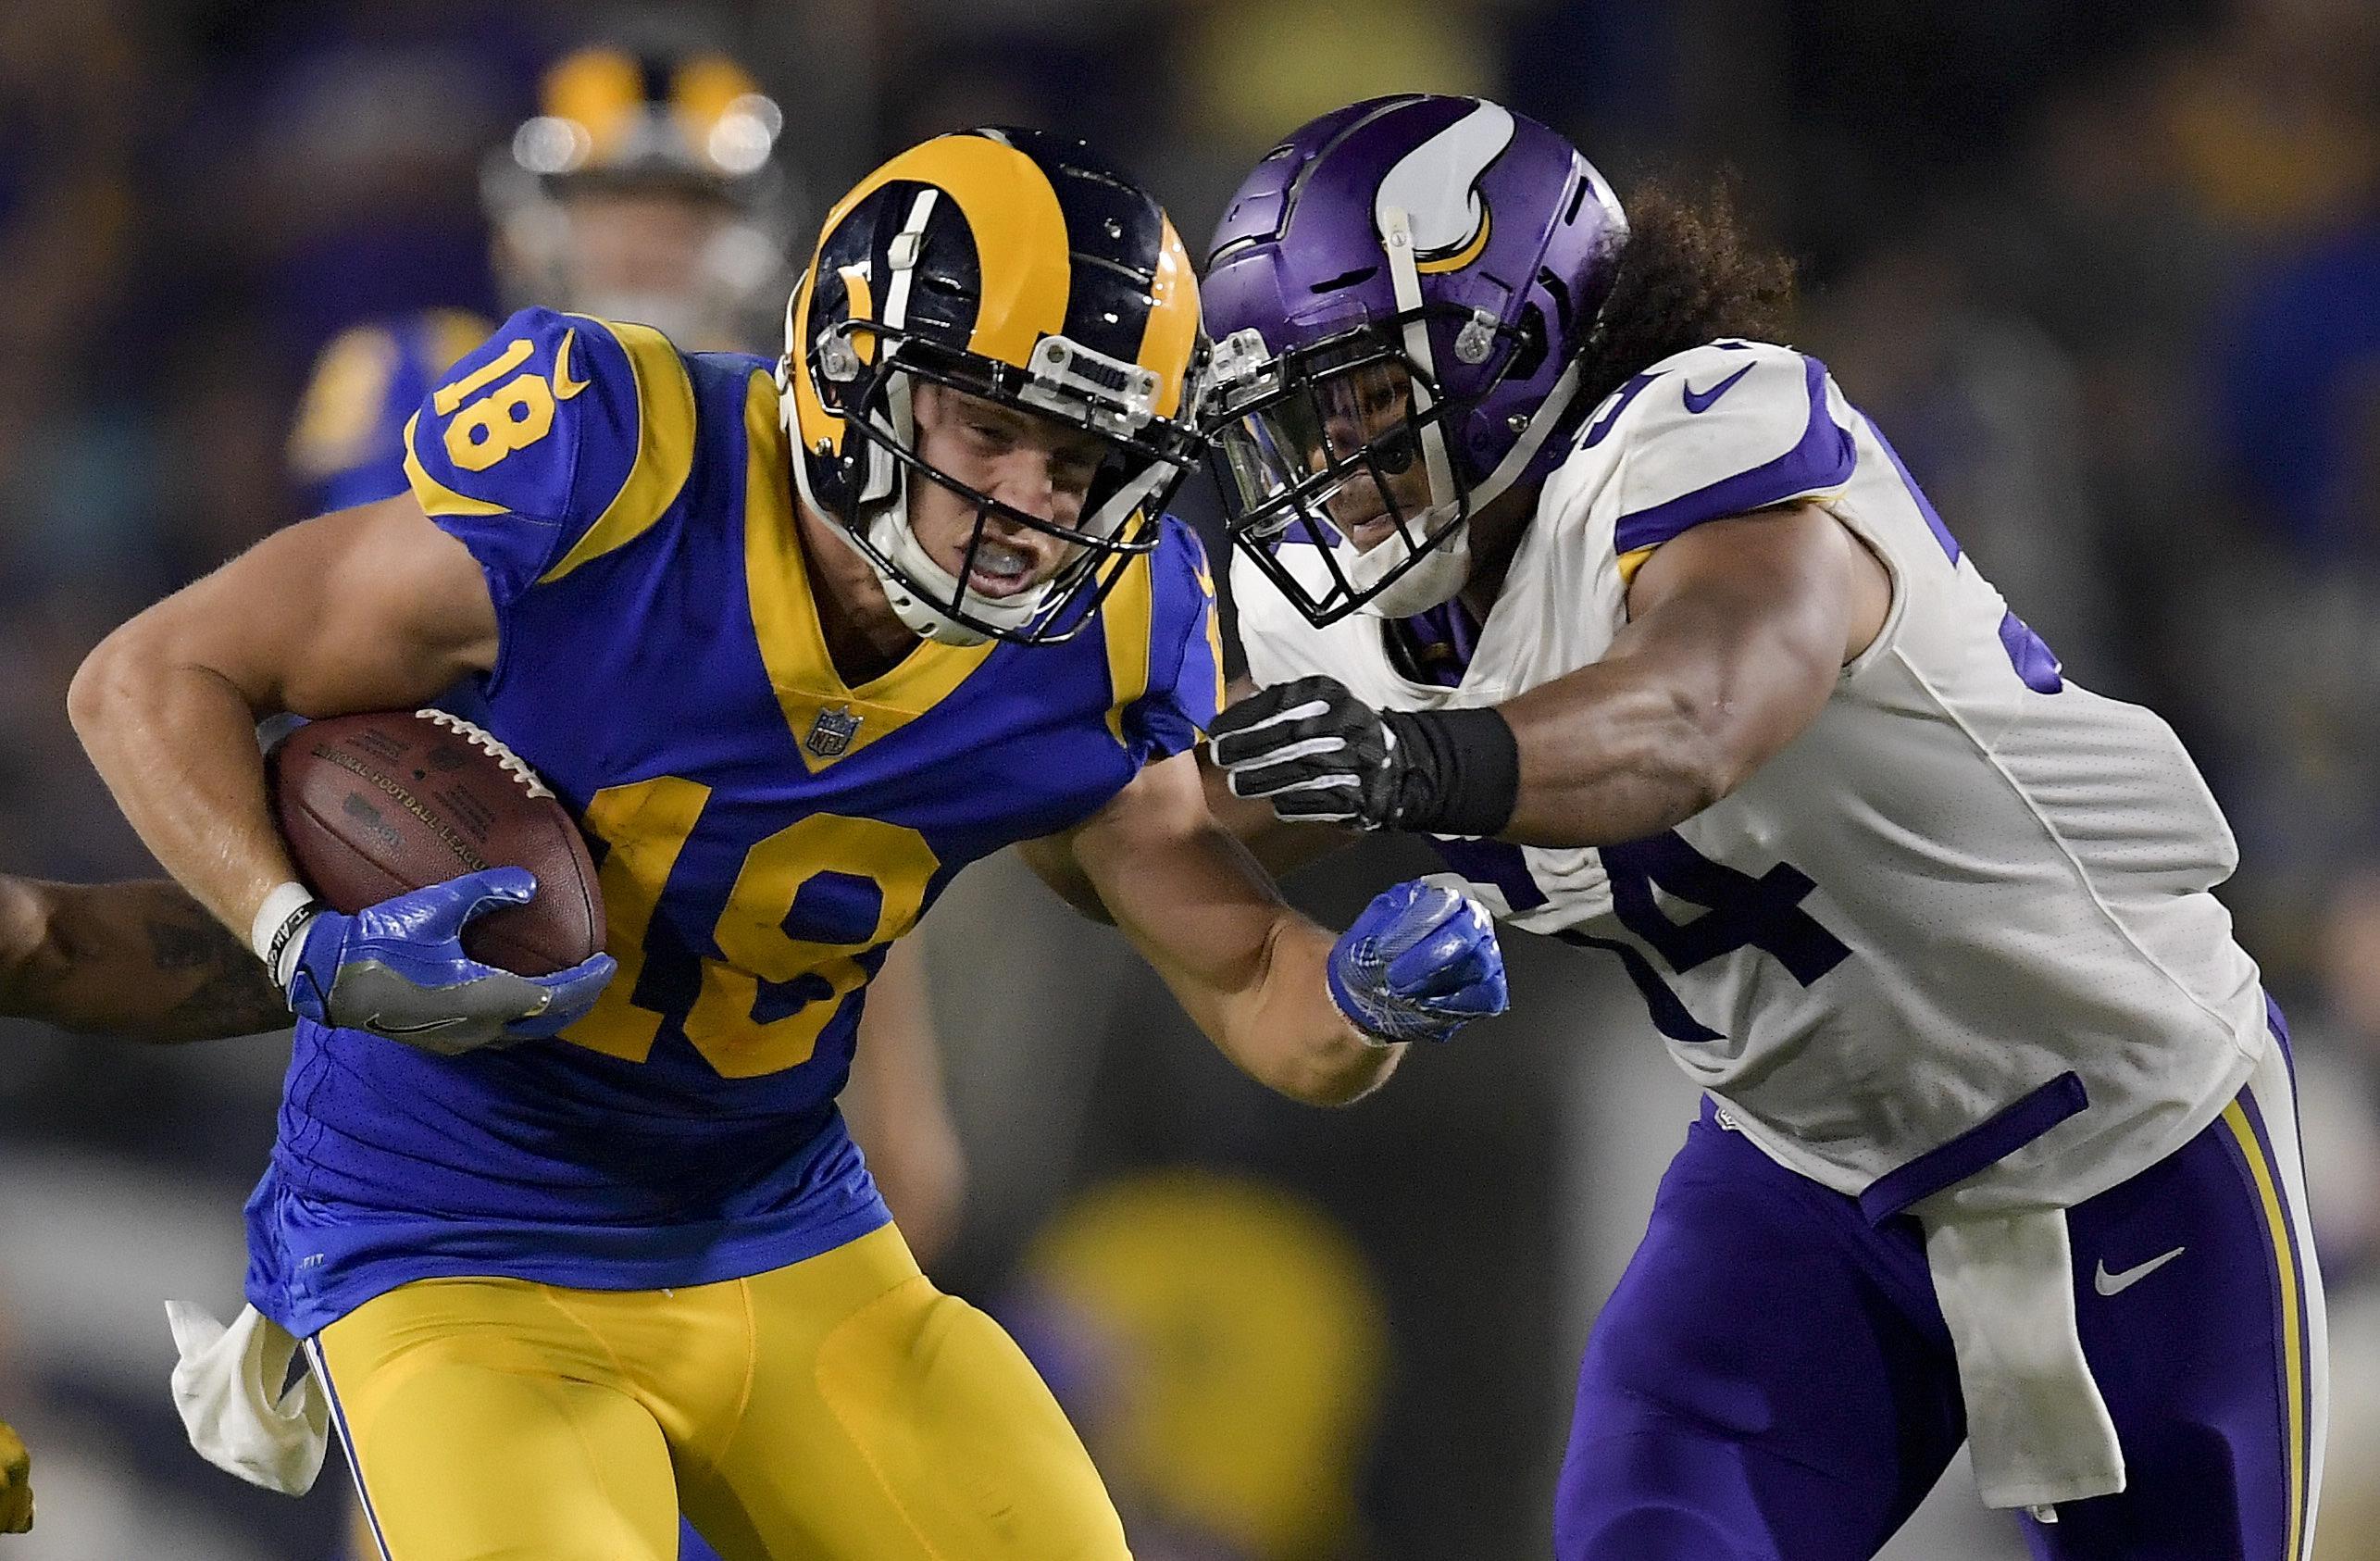 innovative design 589e7 d6daf Cooper Kupp, Jared Goff propel Rams past Vikings, 38-31 ...